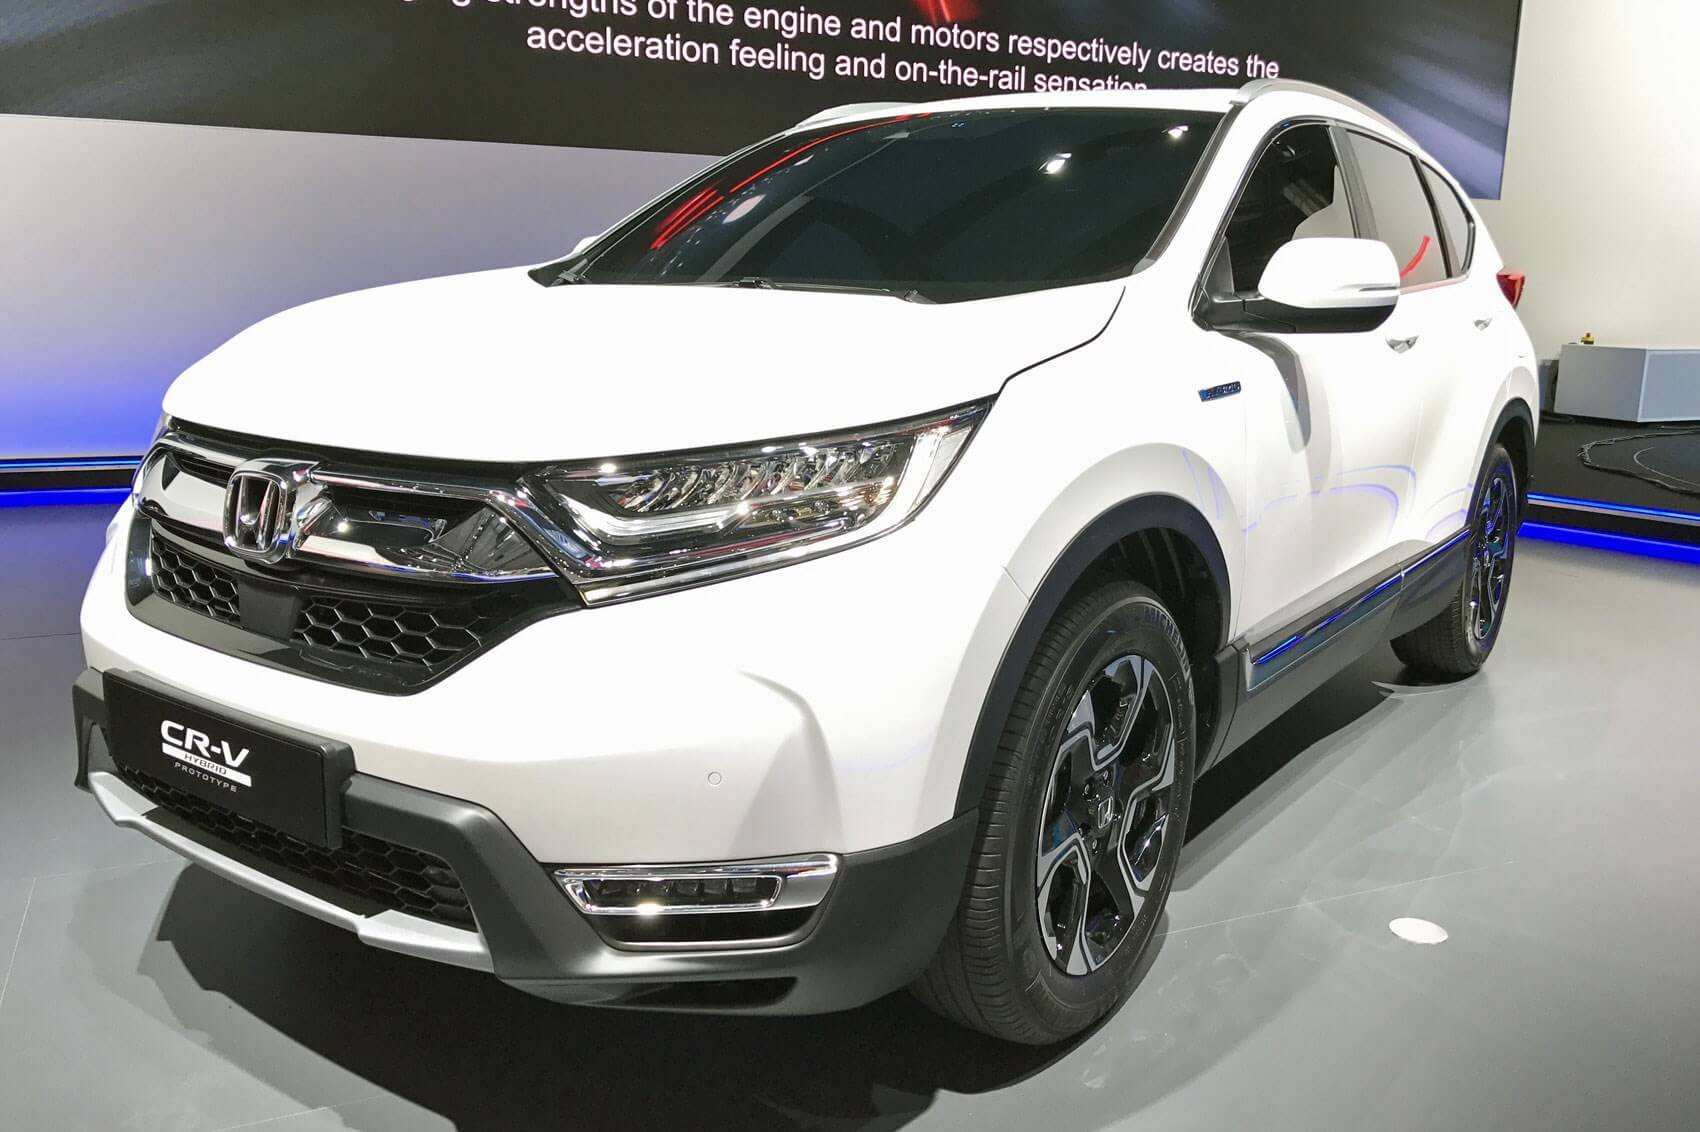 30 Great Honda Crv 2020 Review with Honda Crv 2020